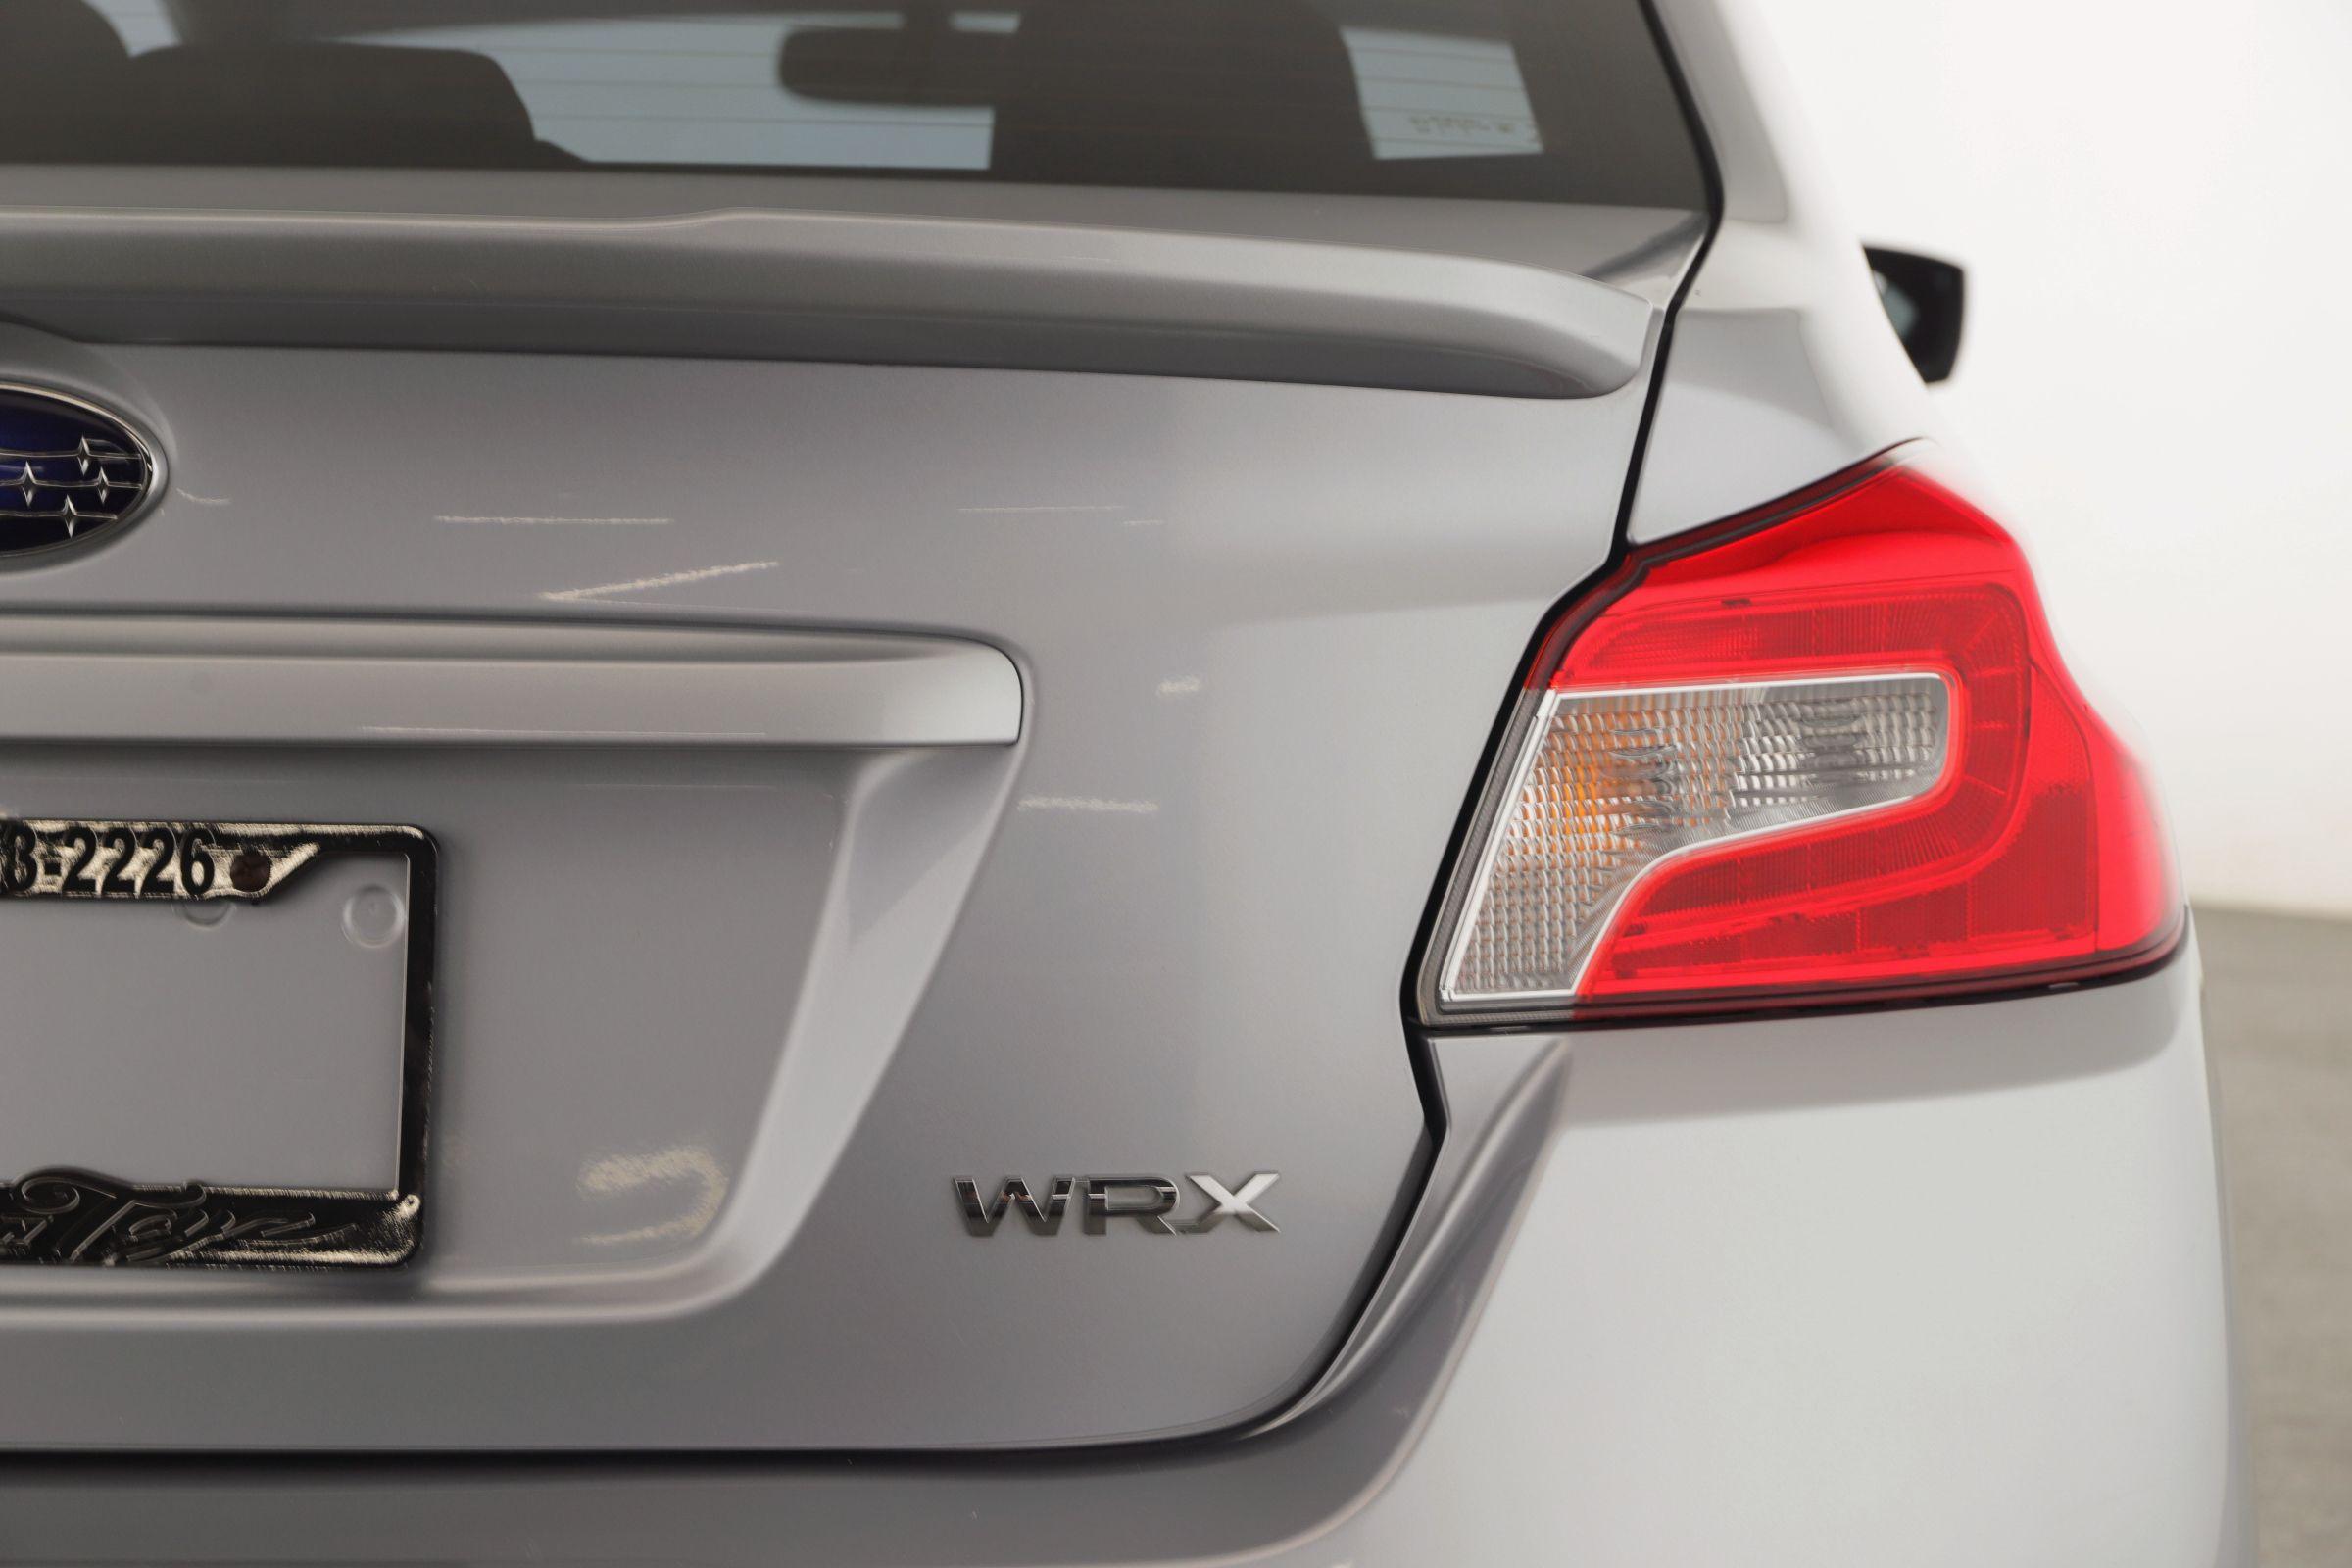 Pre-Owned 2016 Subaru WRX